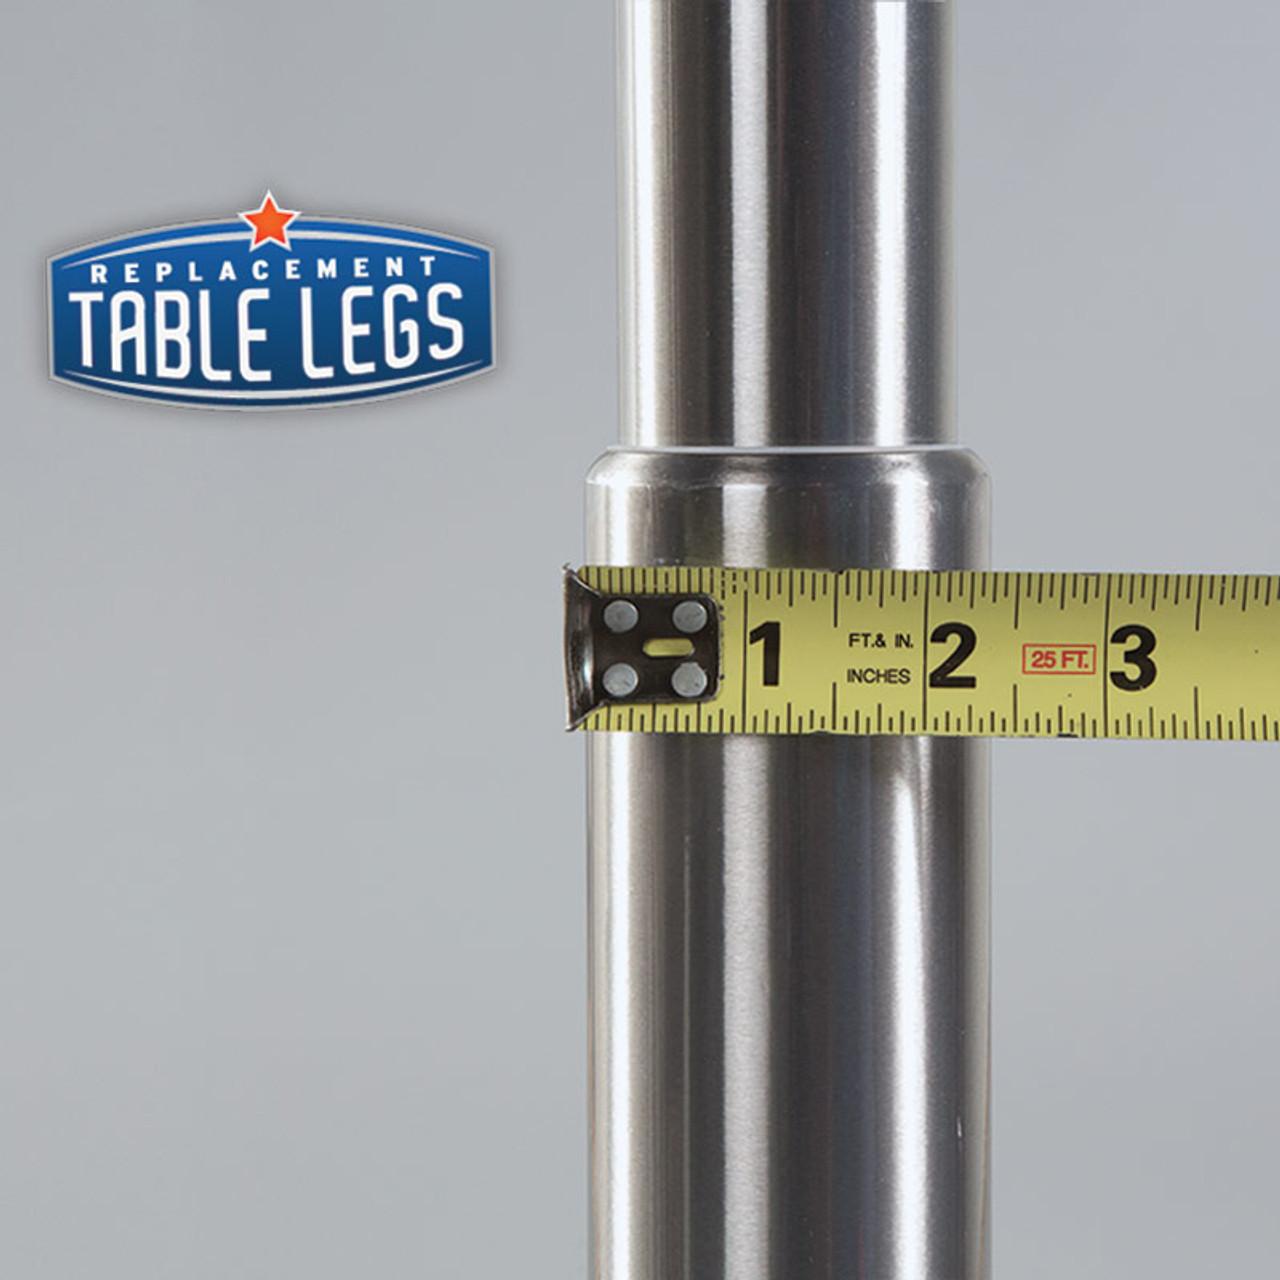 Brushed Steel Studio Telescoping Table Leg - replacementtablelegs.com